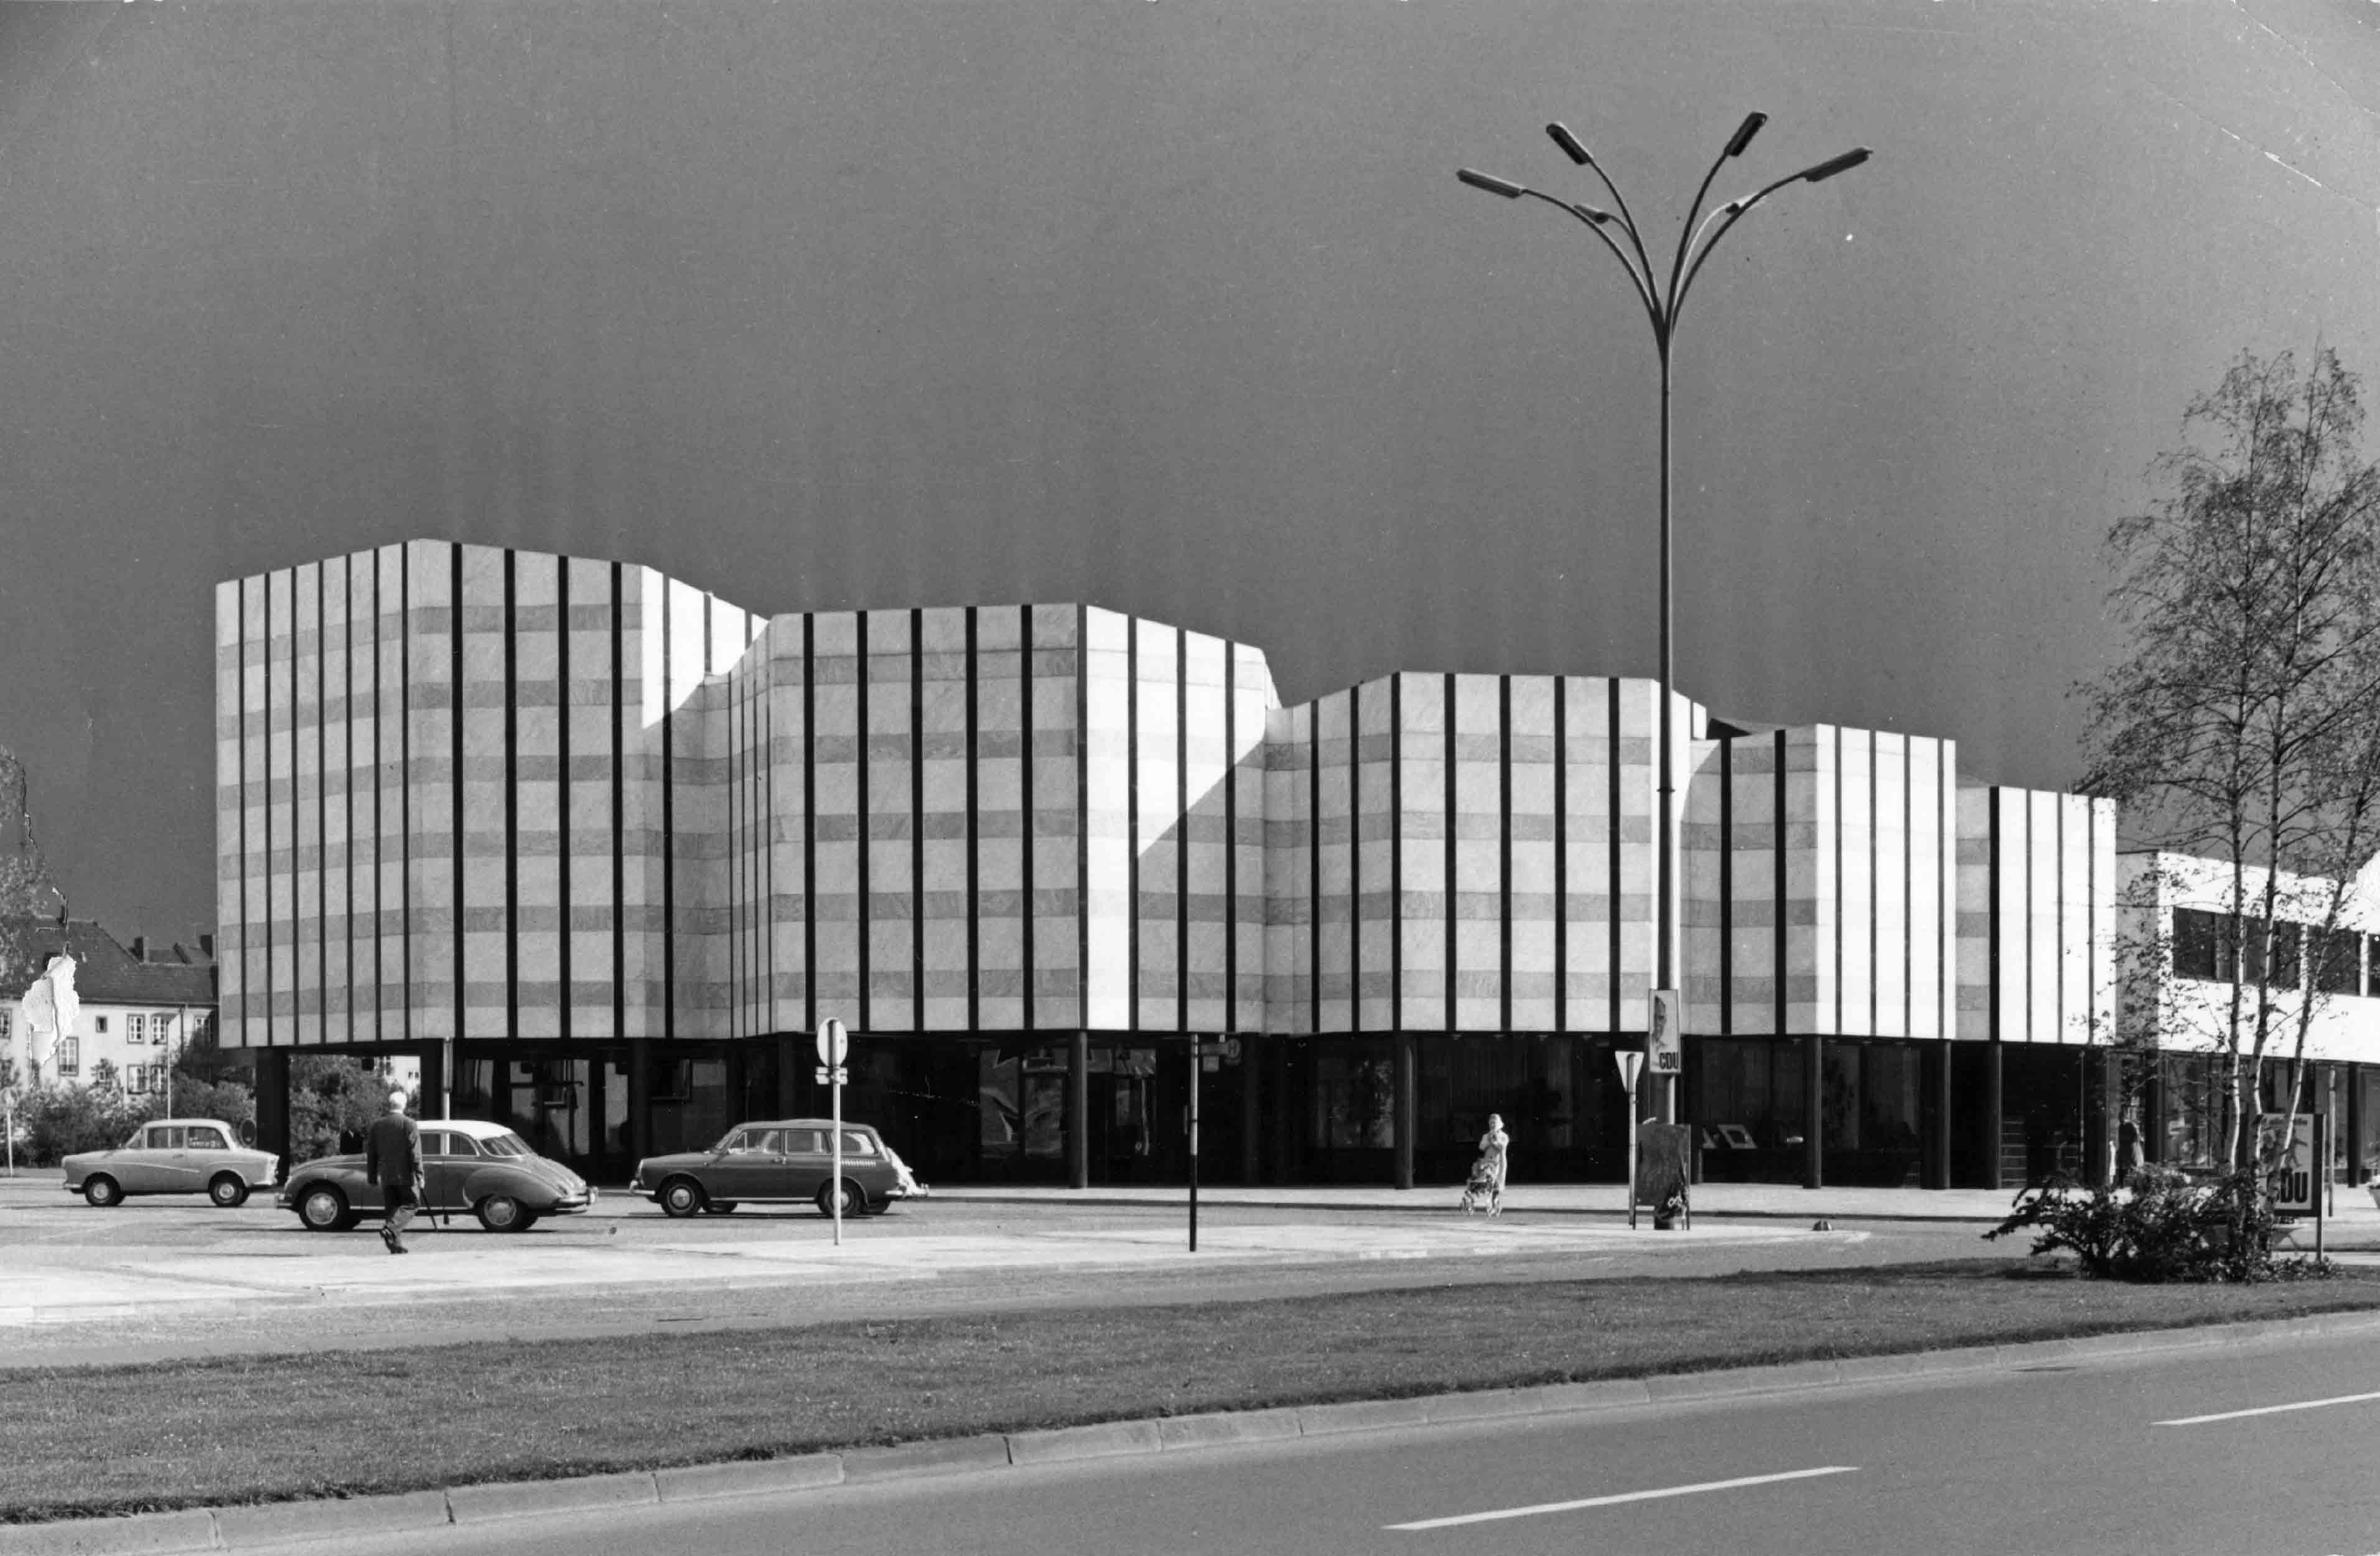 Centre culturel, Wolsfburg ©Alvar Aalto Museum, photo Leonardo Mosso, VG Bild-Kunst, Bonn, 2014